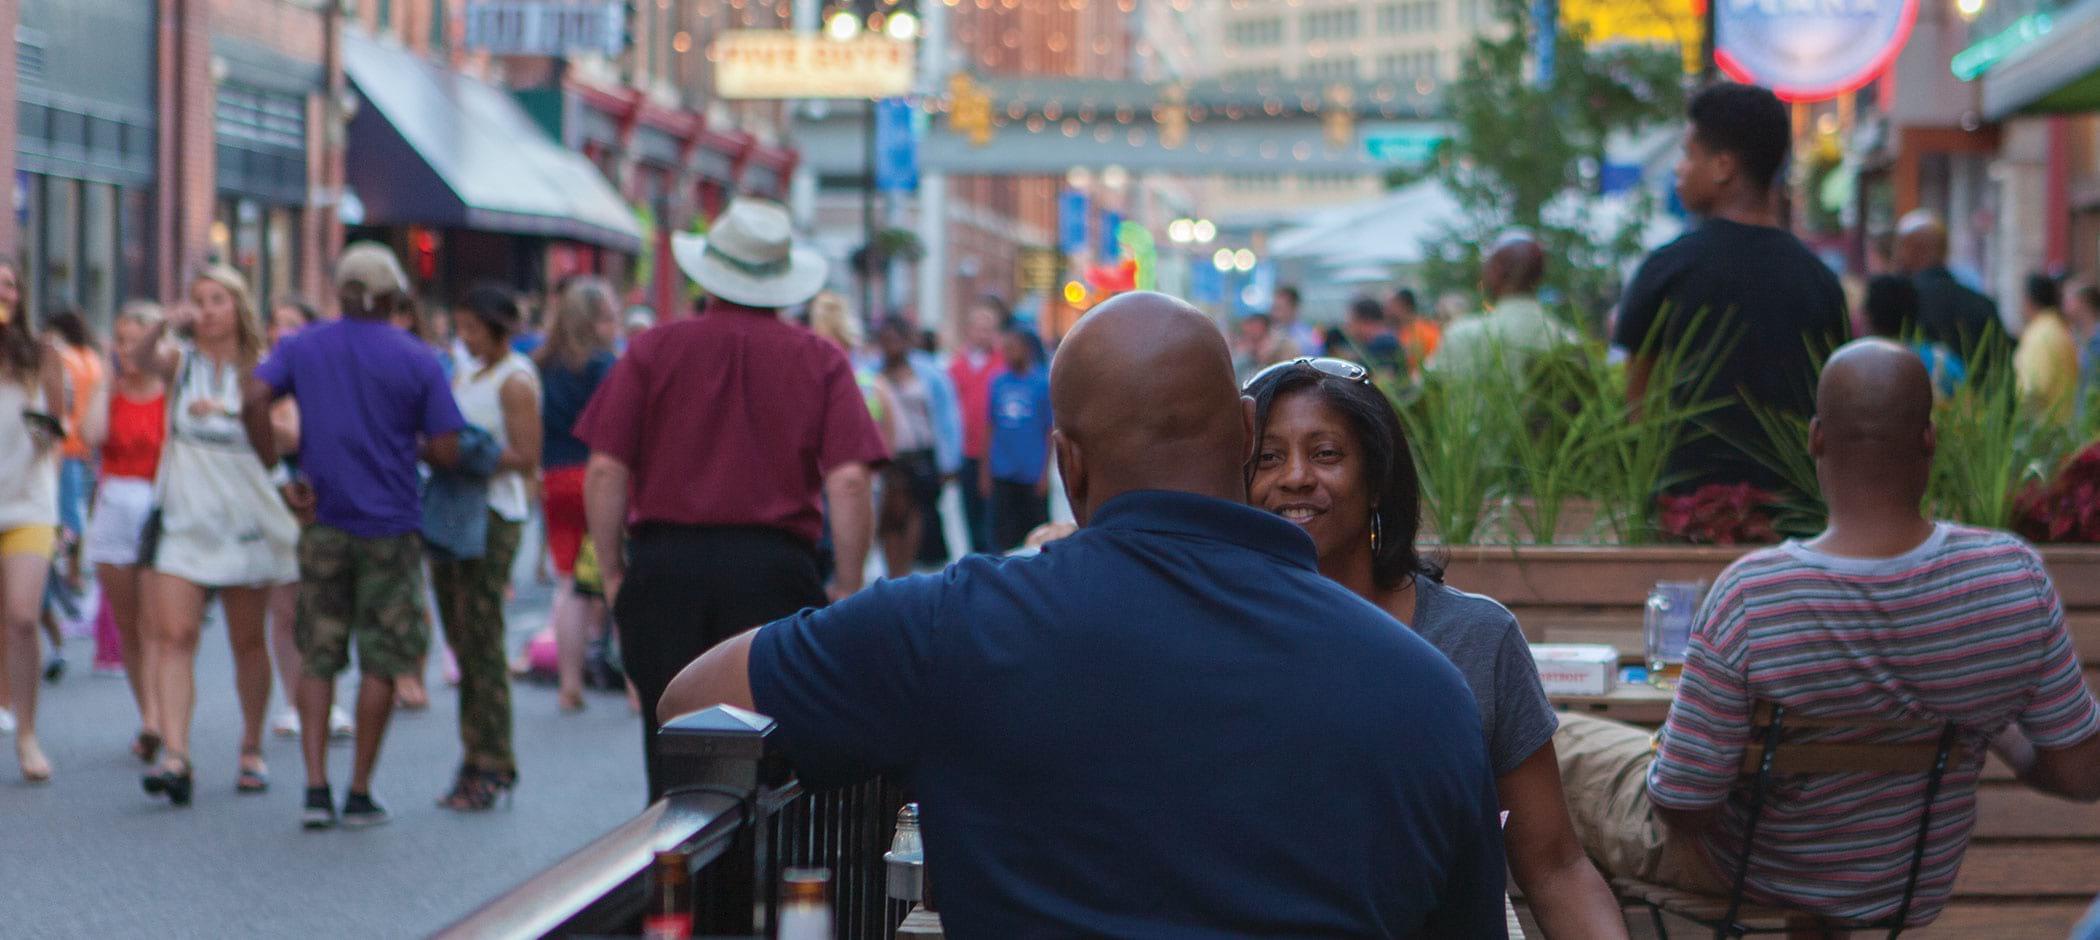 Enjoy downtown Detroit in Greektown, one of Detroit's points of interest